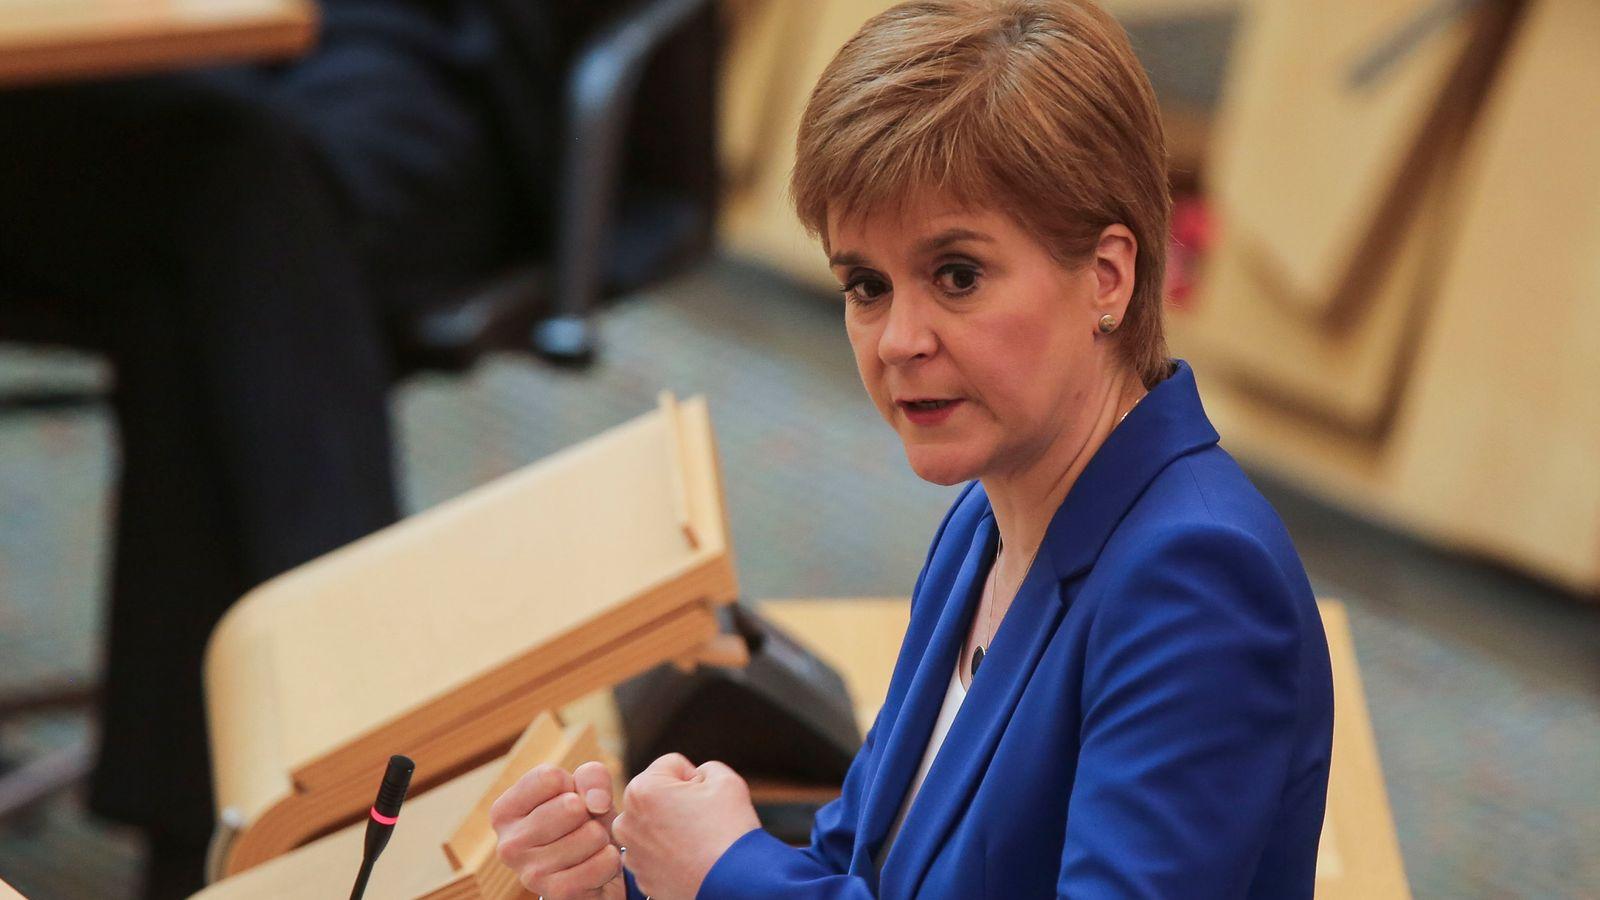 Coronavirus: Outdoor sports to resume in Scotland, confirms Nicola Sturgeon